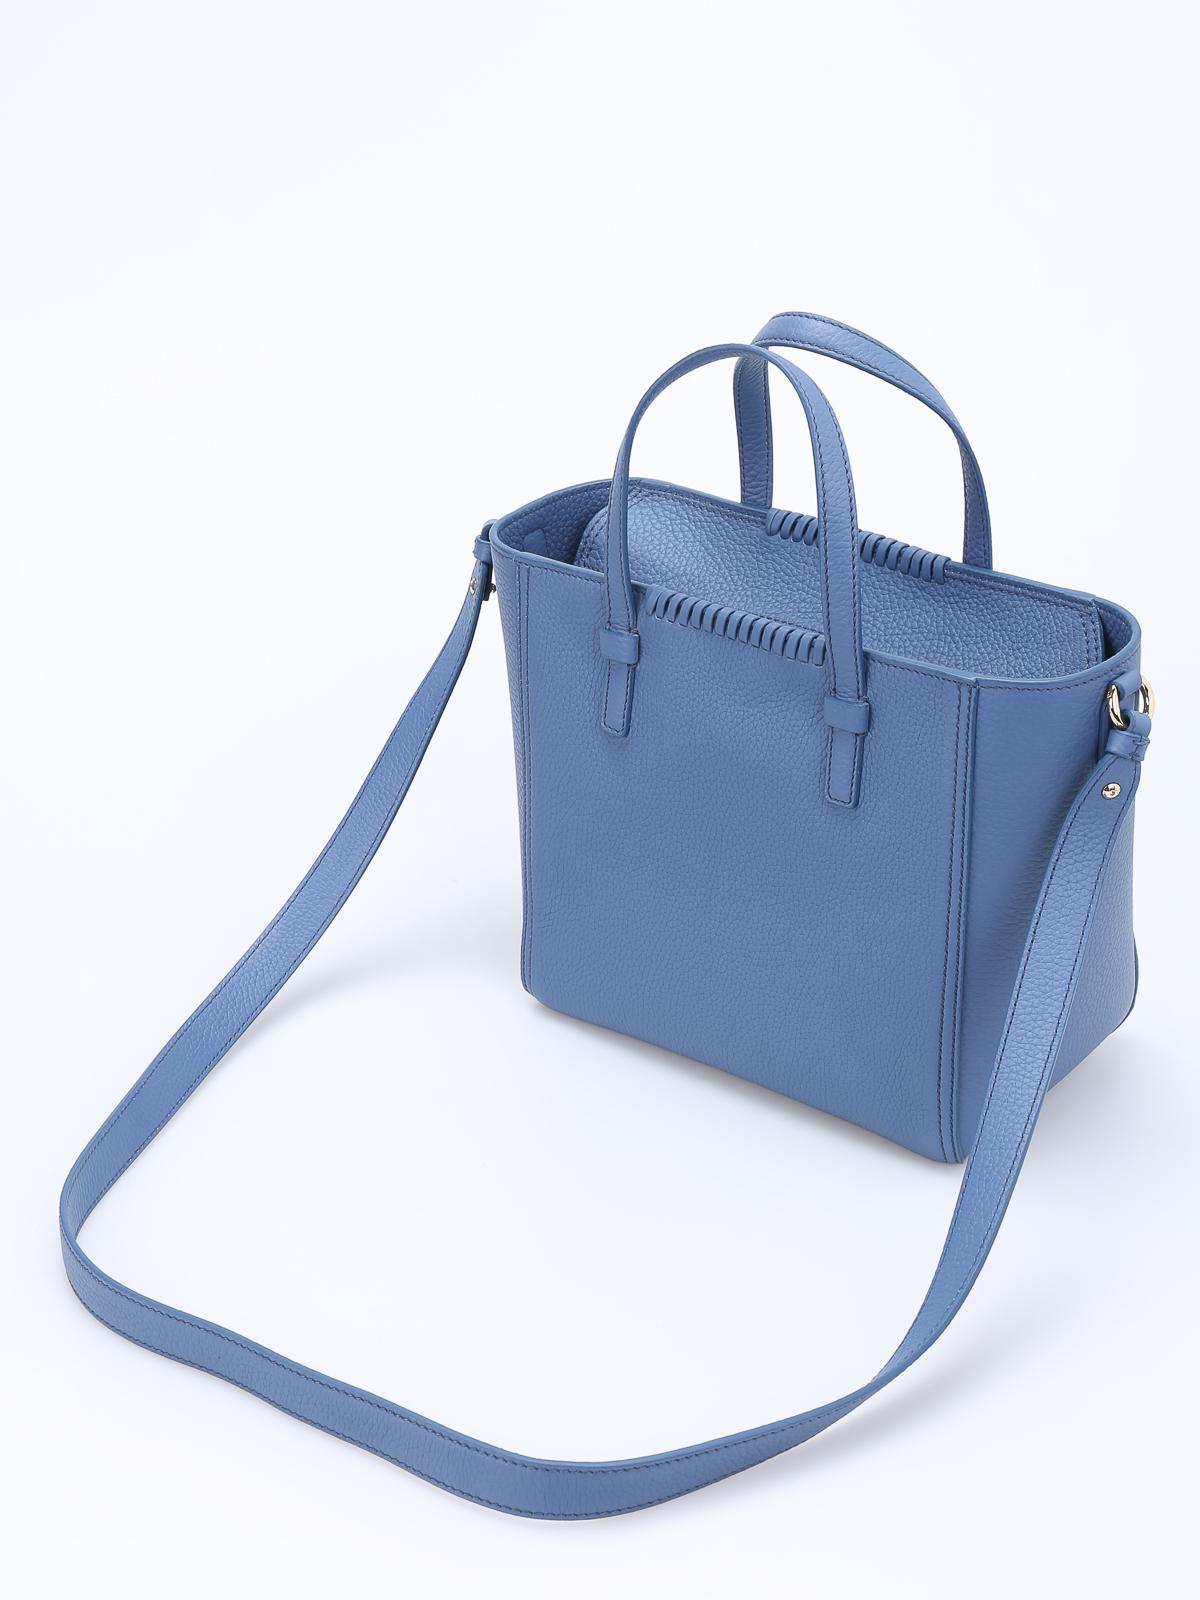 5eb89d90999c iKRIX SALVATORE FERRAGAMO  totes bags - Marta pebbled leather small tote